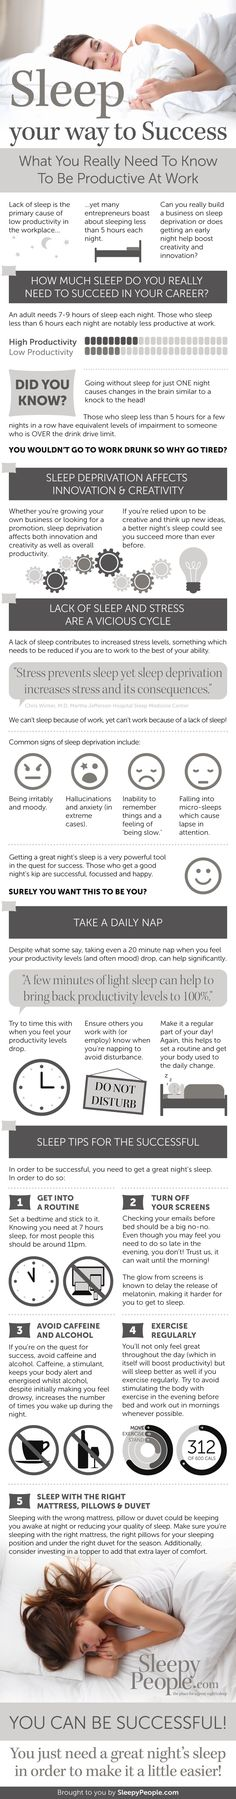 Sleep Your Way To Success